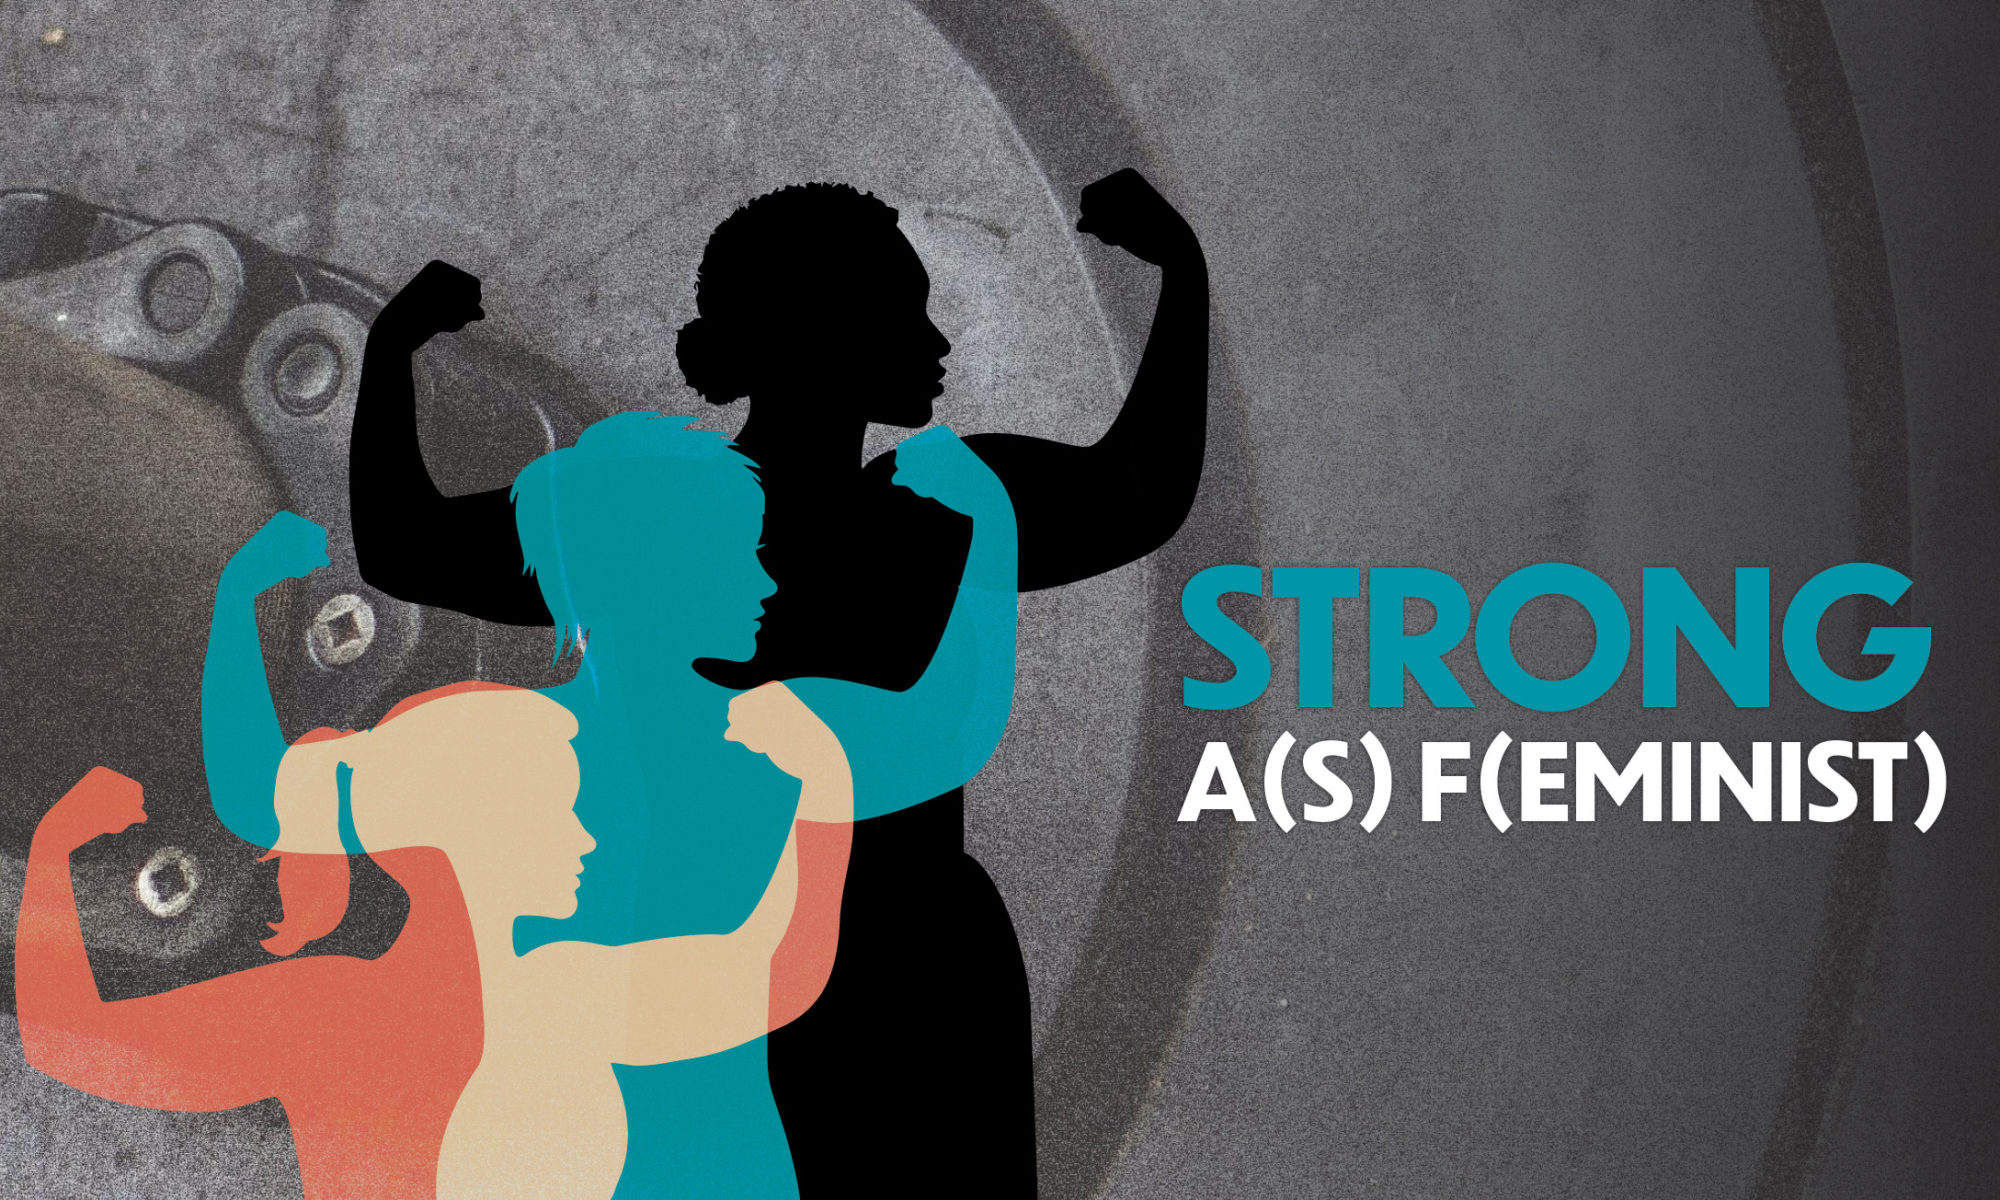 Strong As Feminist